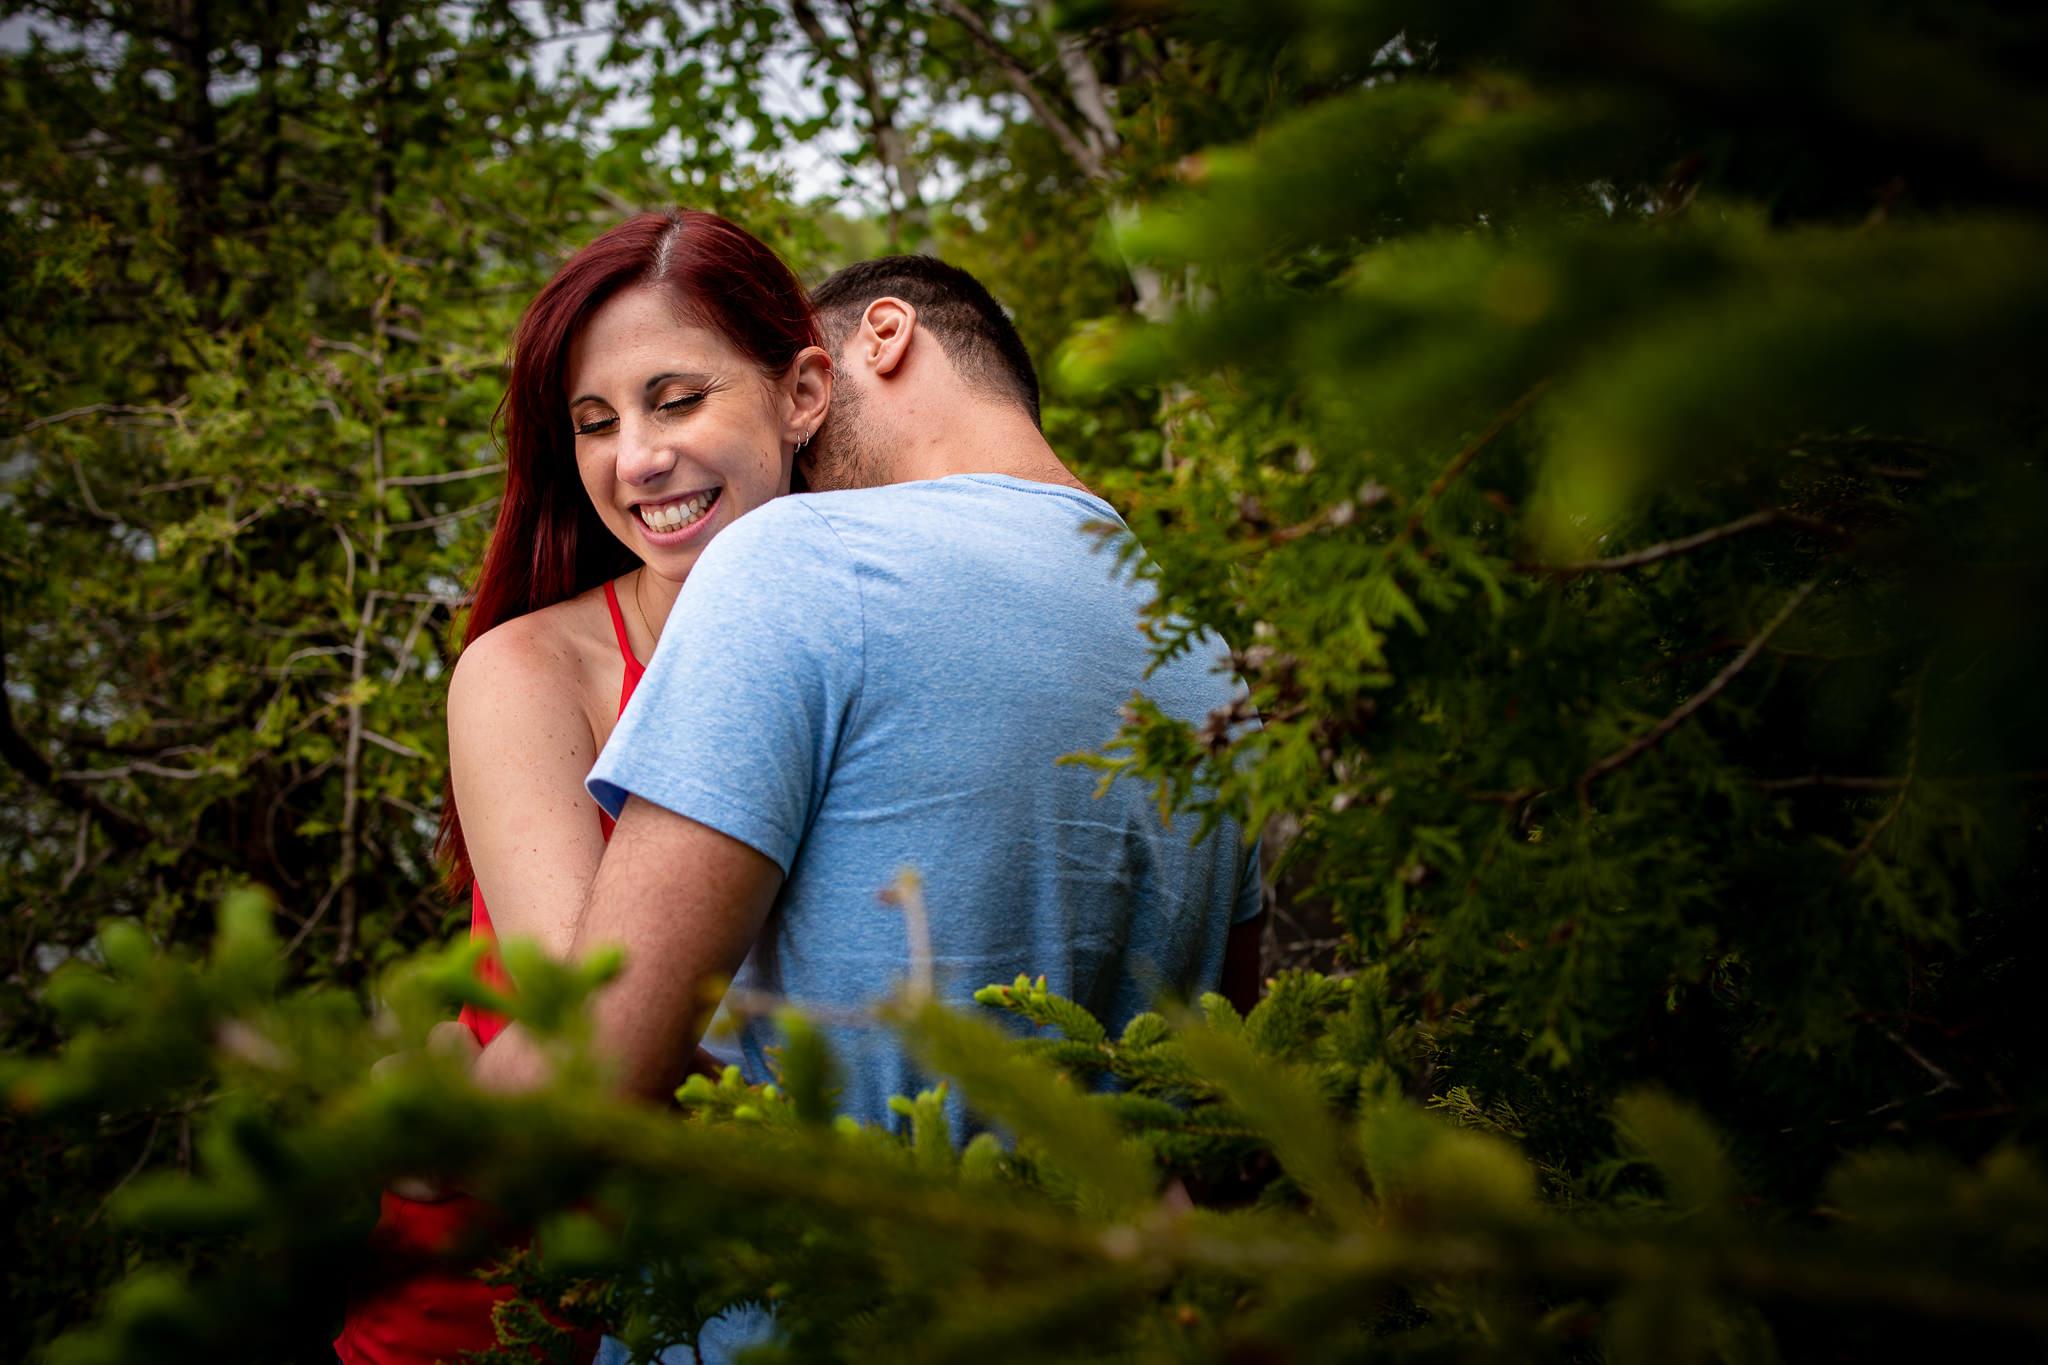 tobermory-engagement-photos-10.jpg